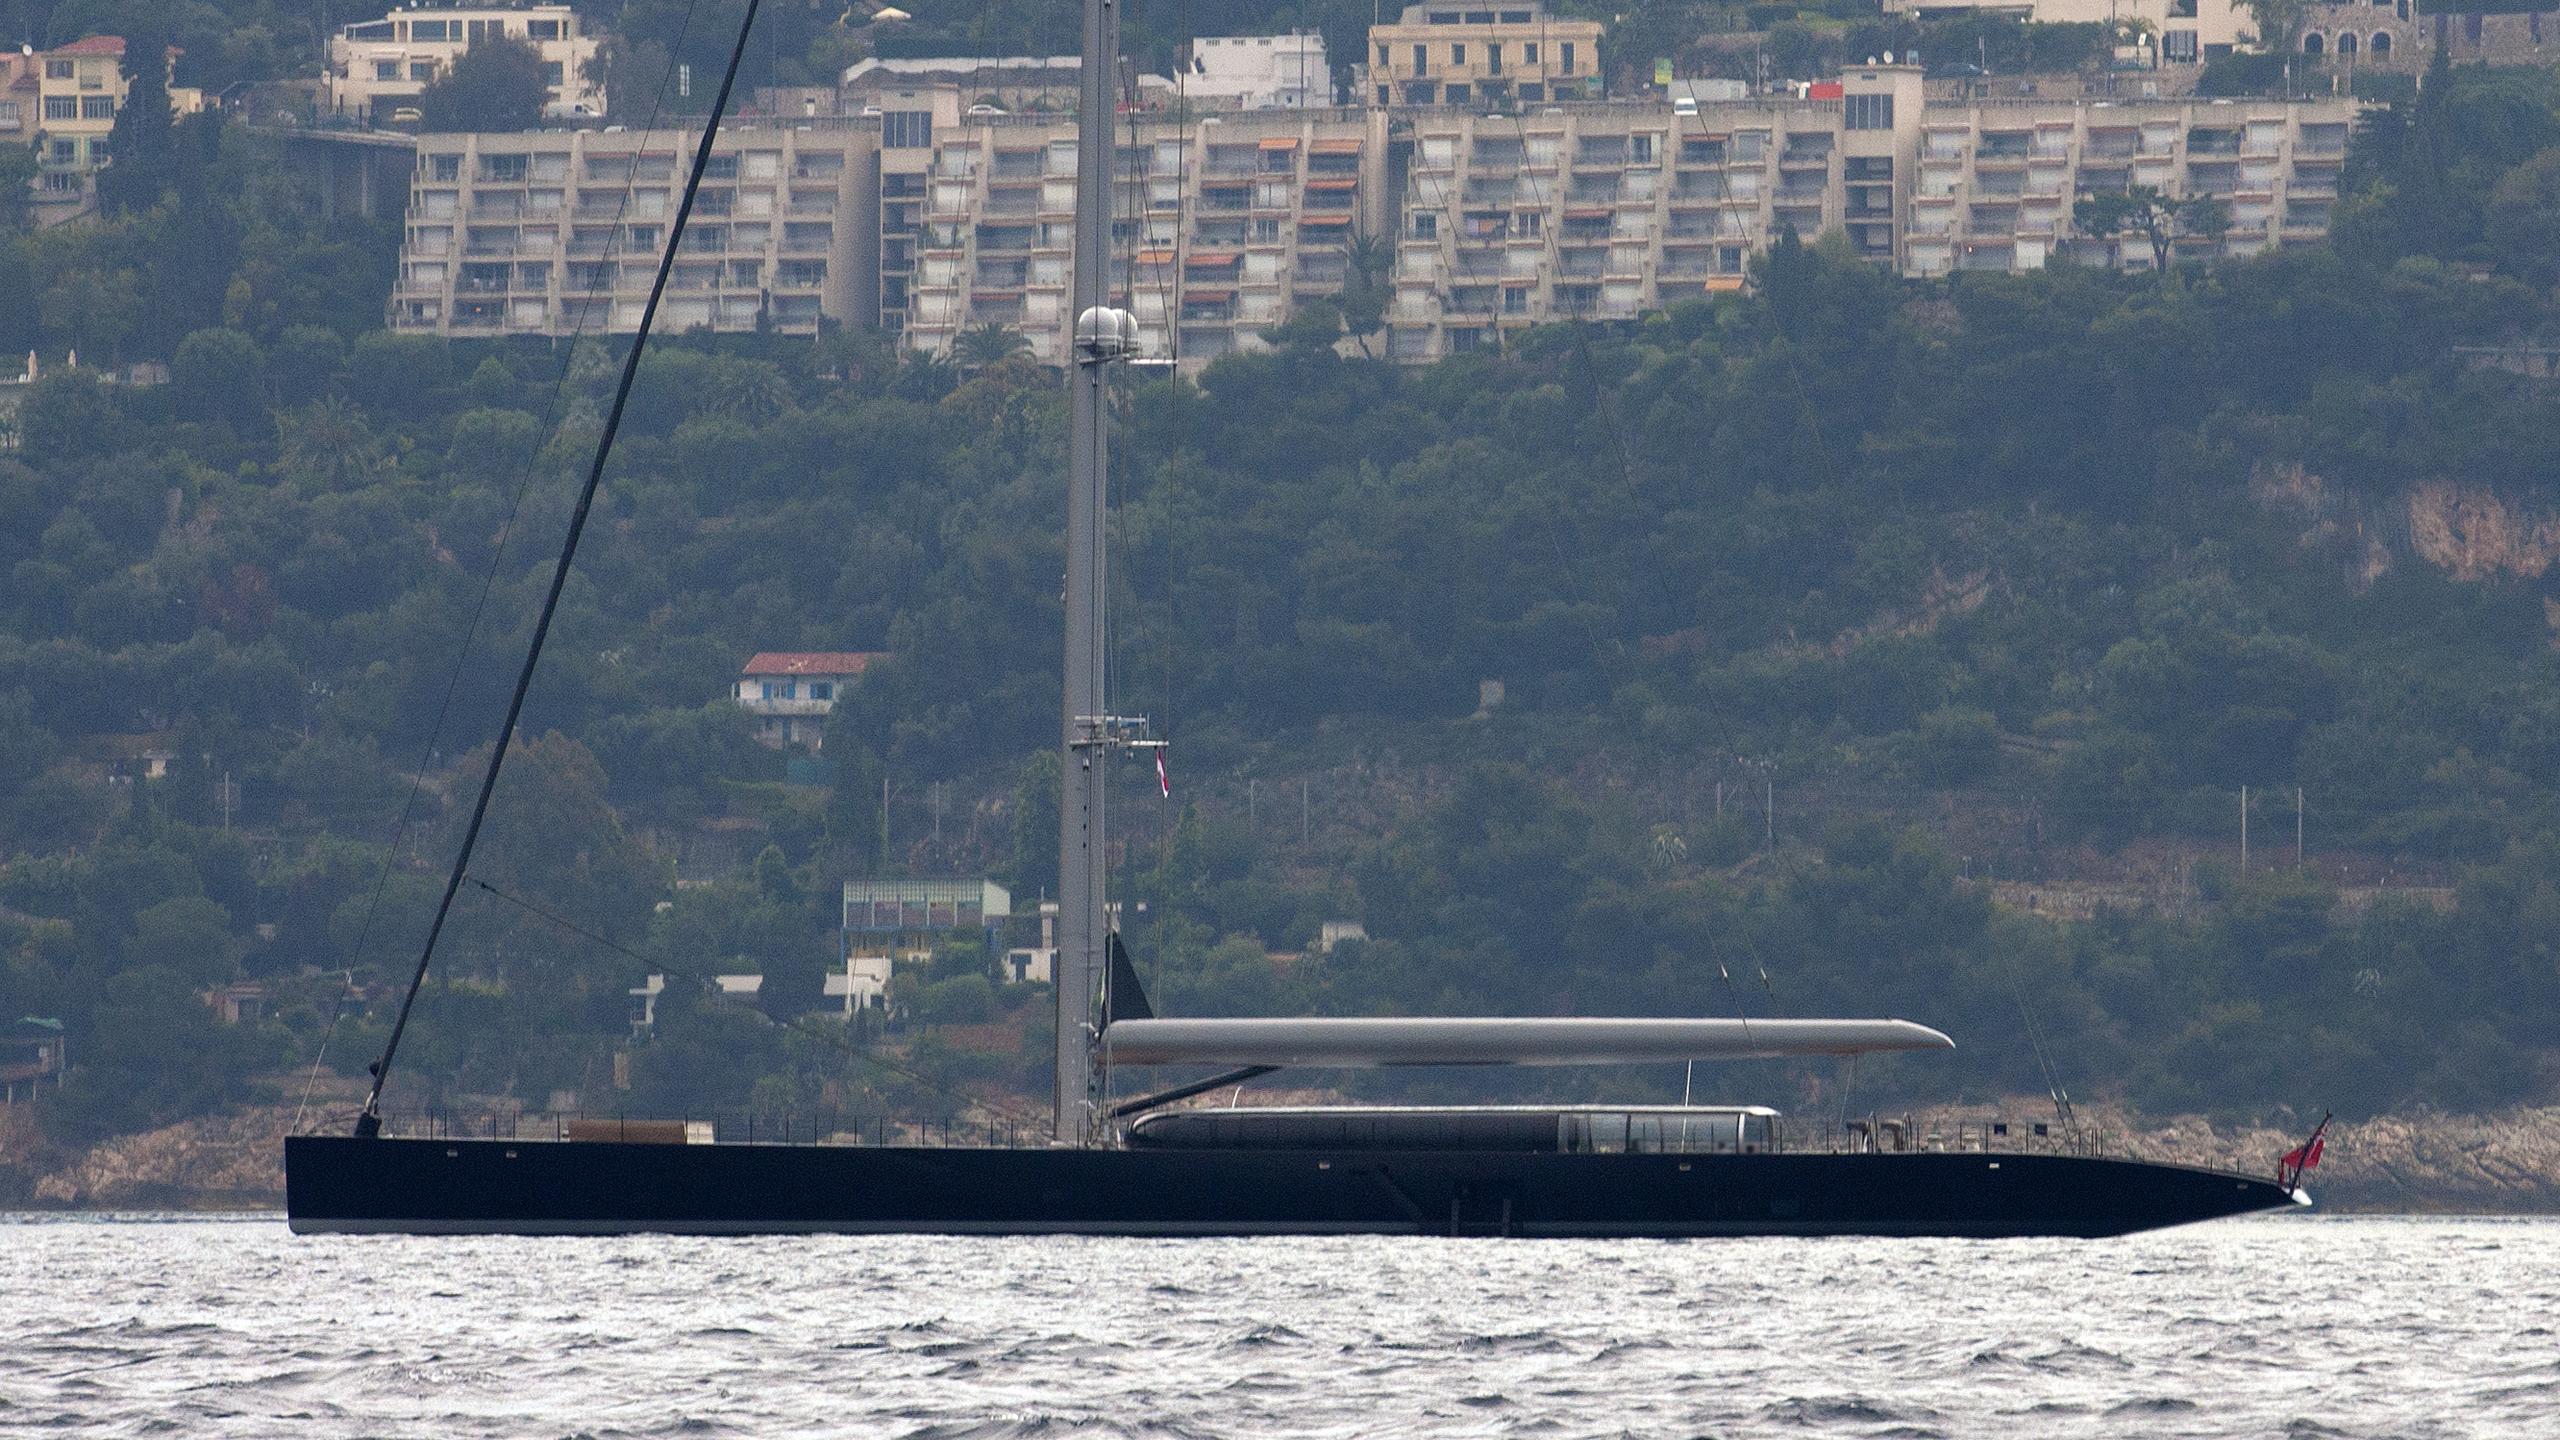 anatta ahimsa aglaia sailing yacht vitters 66m 2011 profile